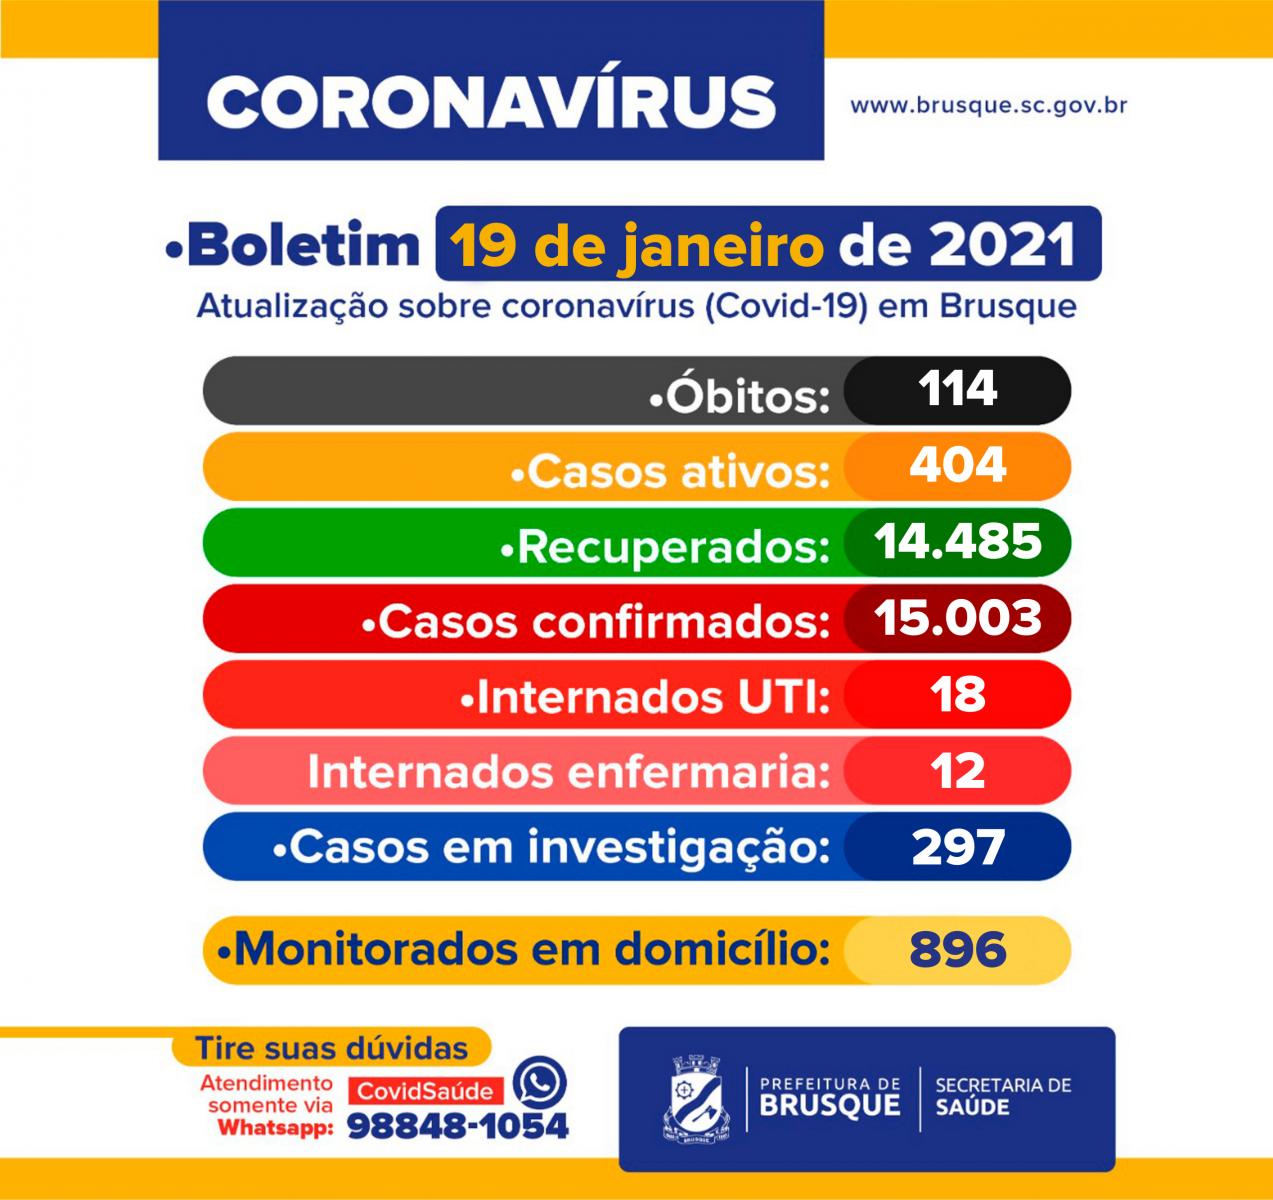 Covid-19: Confira o boletim epidemiológico desta terça-feira (19)